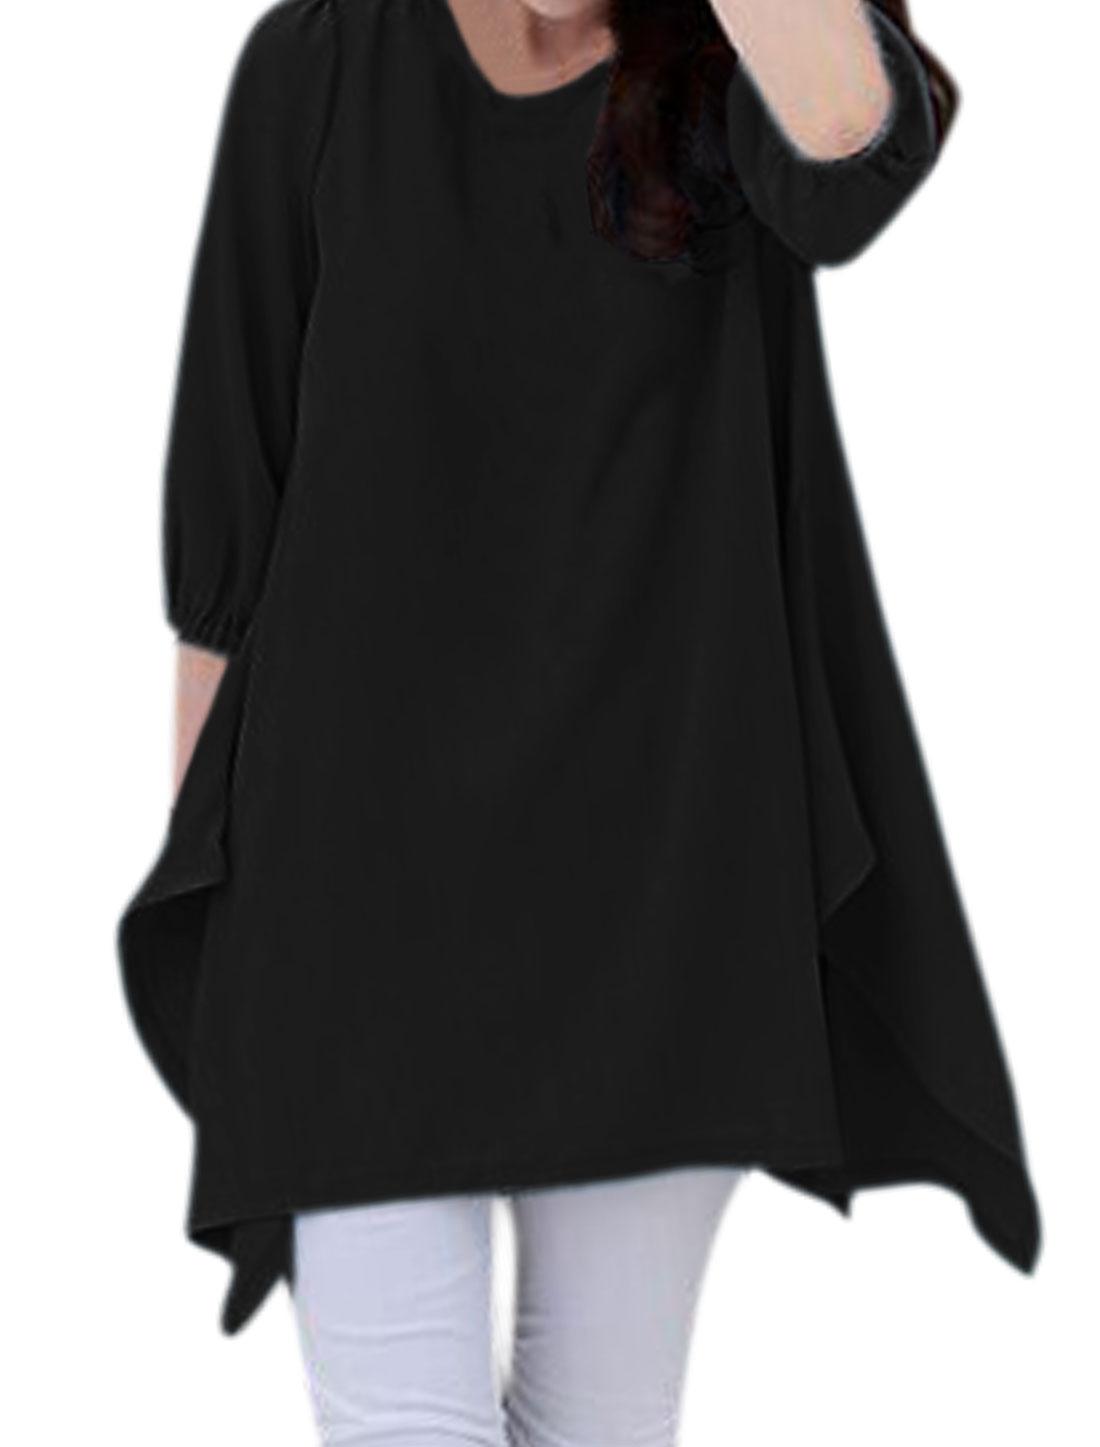 Women 3/4 Sleeves Self Tie Back Irregular Hem Loose Tunic Top Black M